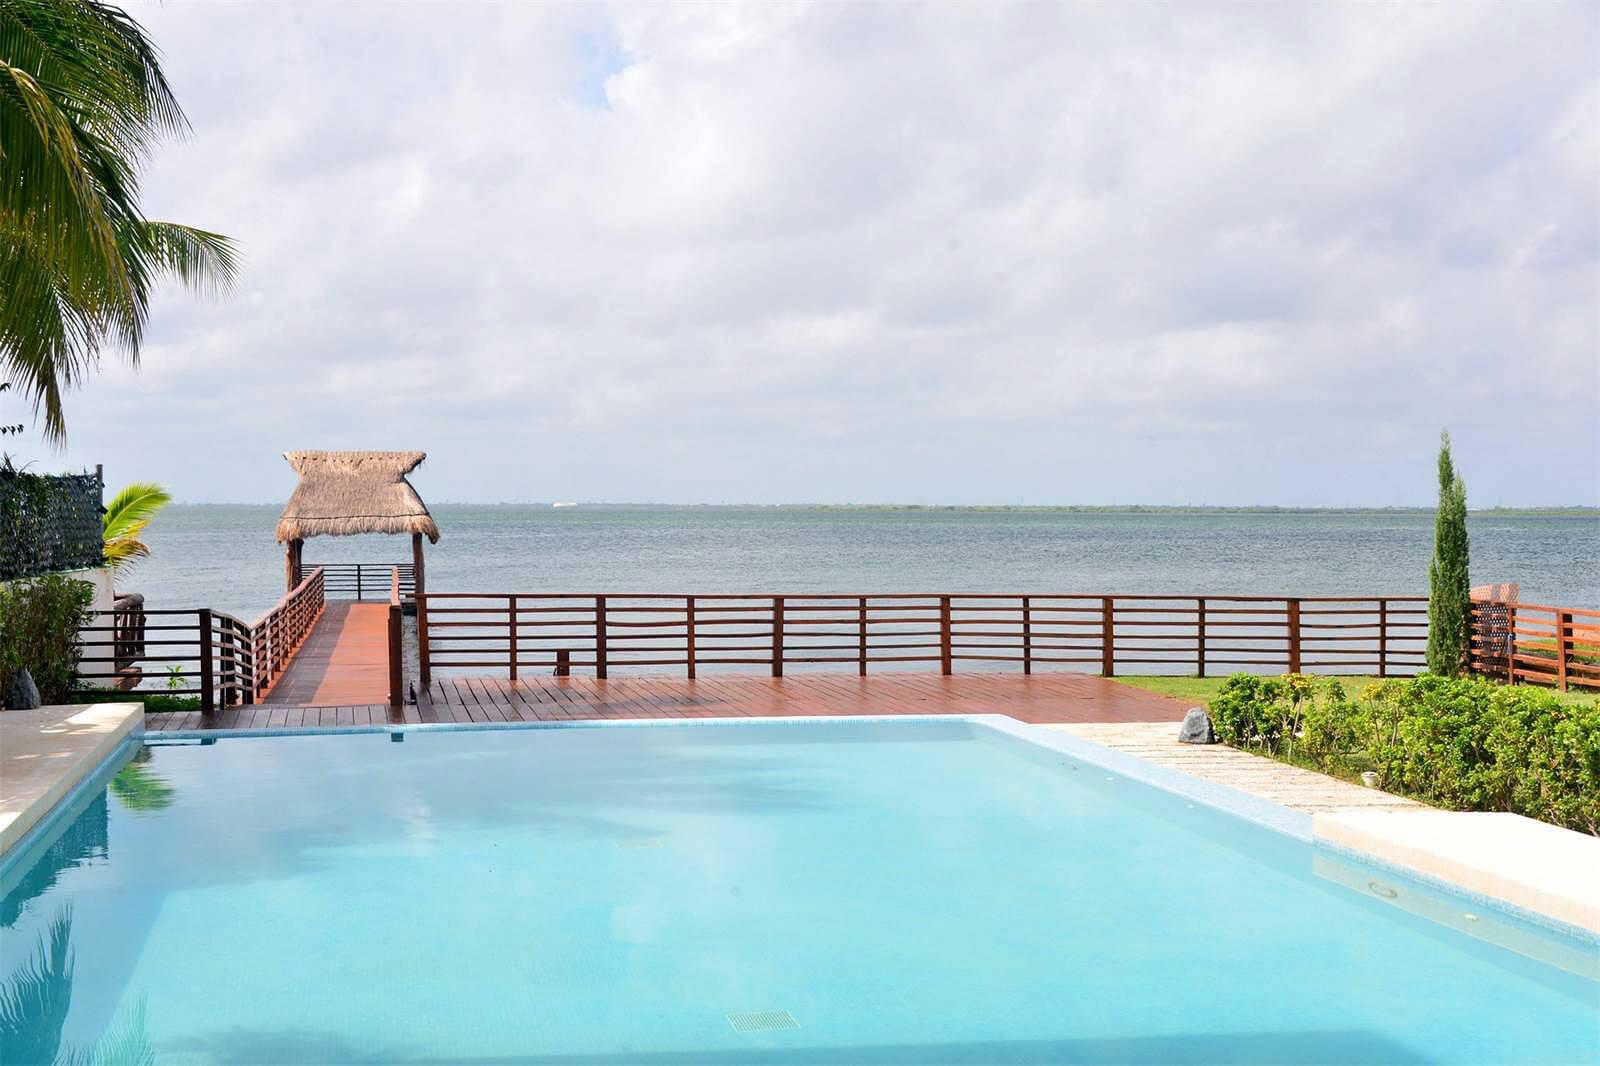 Casa Murmullo, Cancun luxury waterfront home | Riviera Maya Sotheby's |Finest Residences